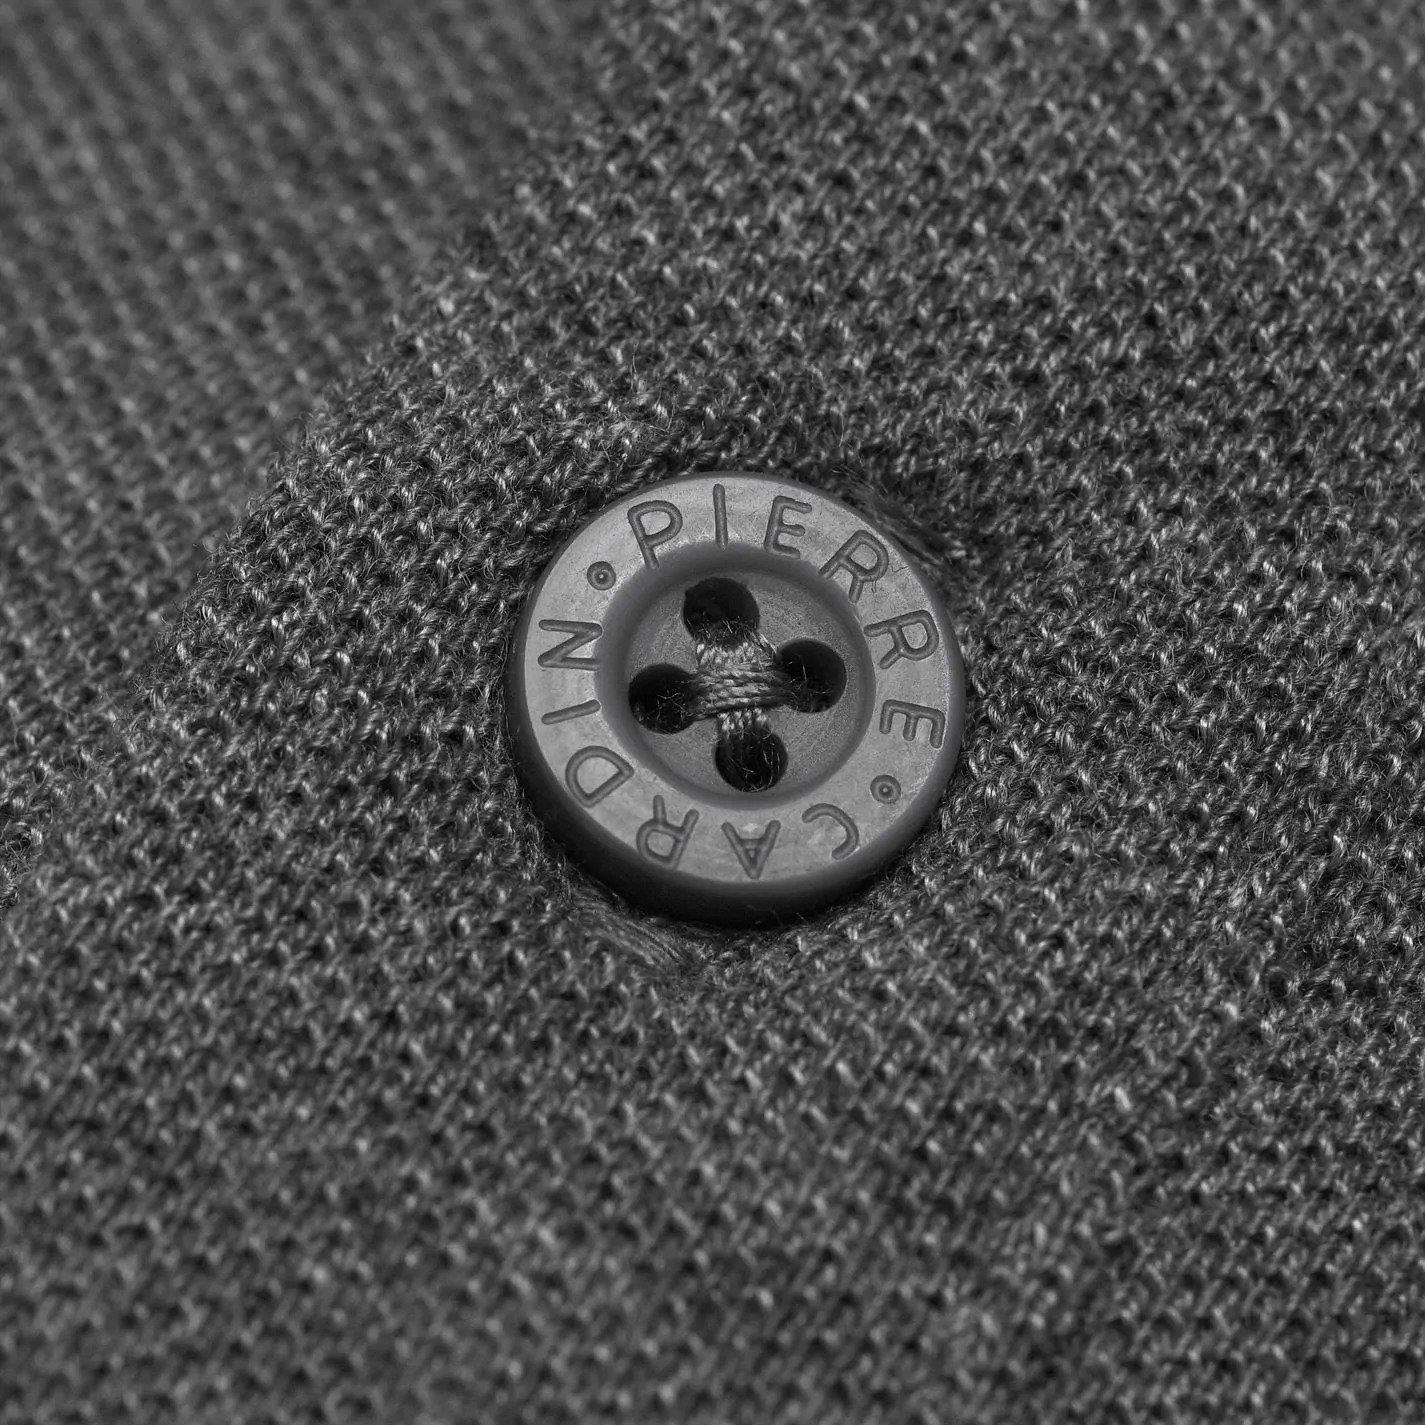 NEW-Pierre-Cardin-Mens-Long-Sleeve-Pure-Cotton-Polo-Shirt-Size-S-M-L-XL-XXL thumbnail 17